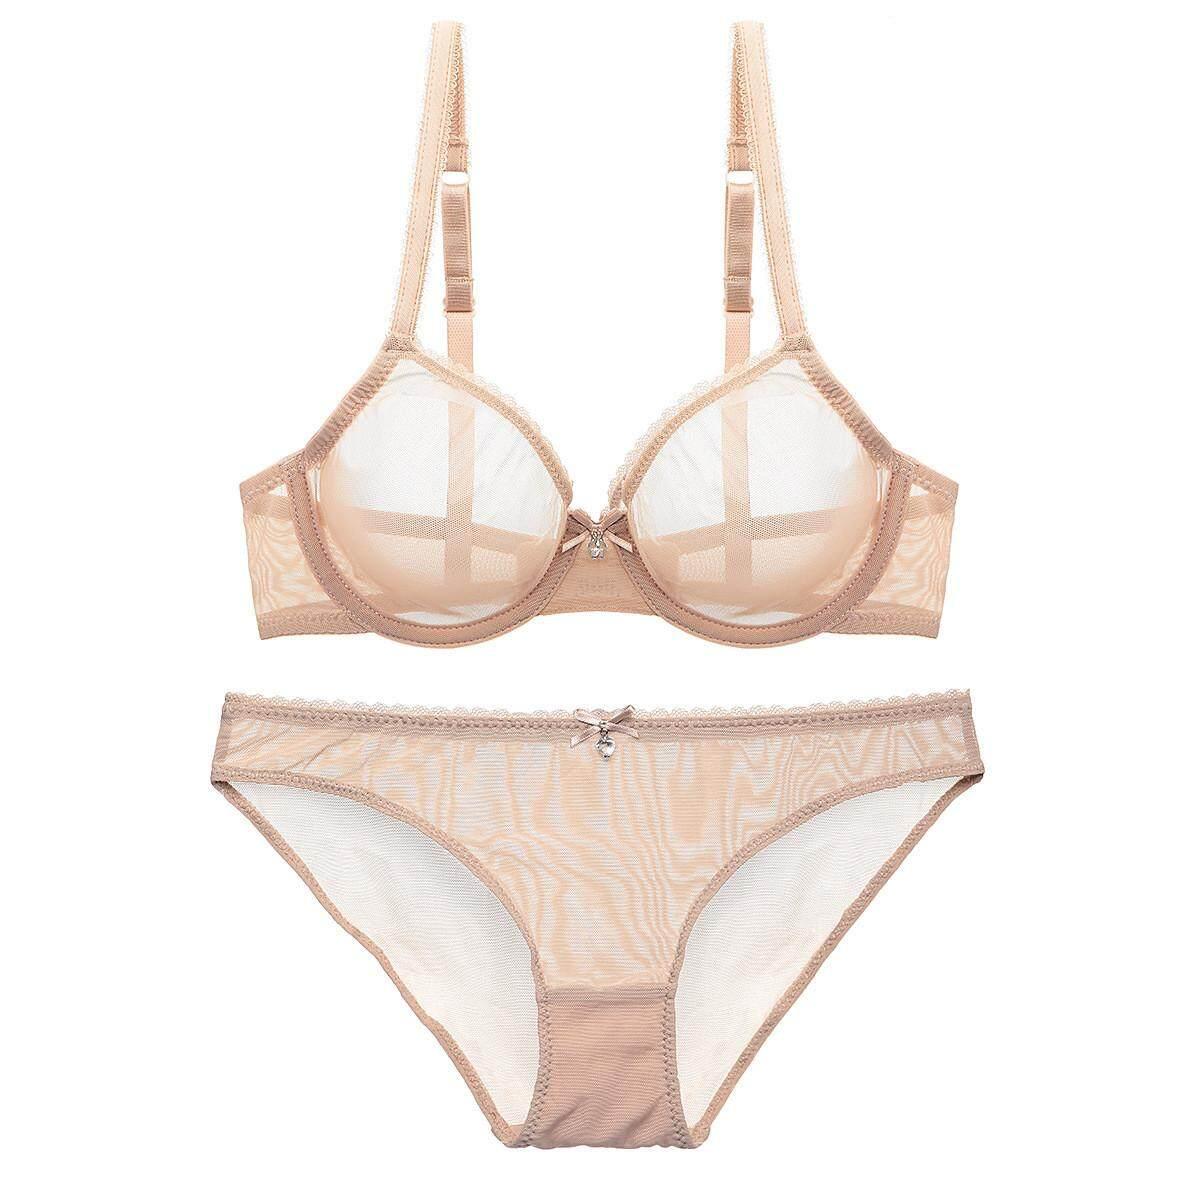 7873134925 2019 GG Appealing Women Sexy Bra Panty Set Underwear Intimates Lace Lingerie